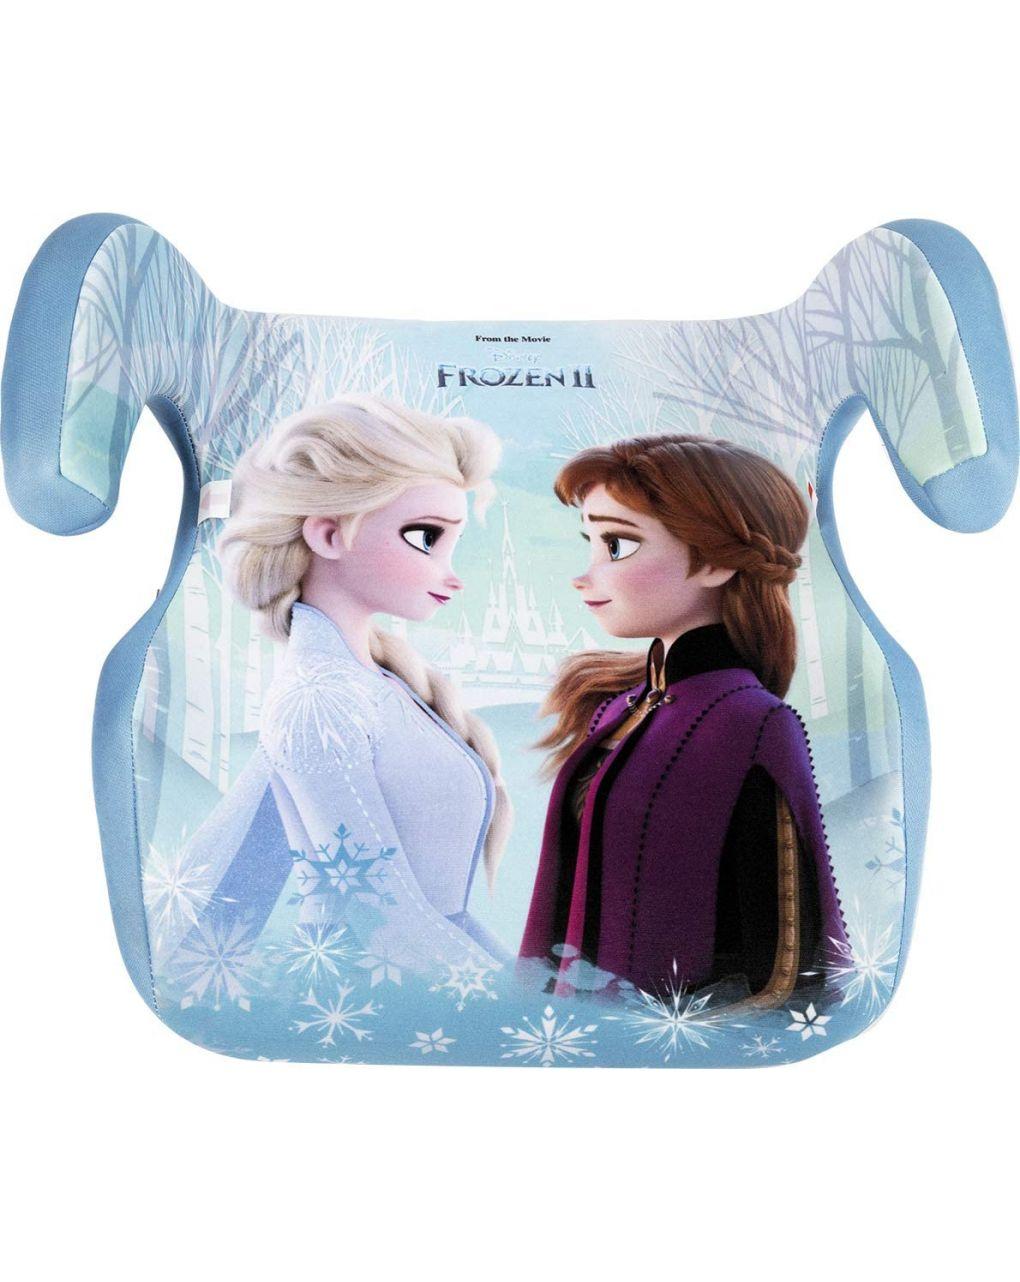 Alzabimbo por autocongelado 15-36 kg - Disney